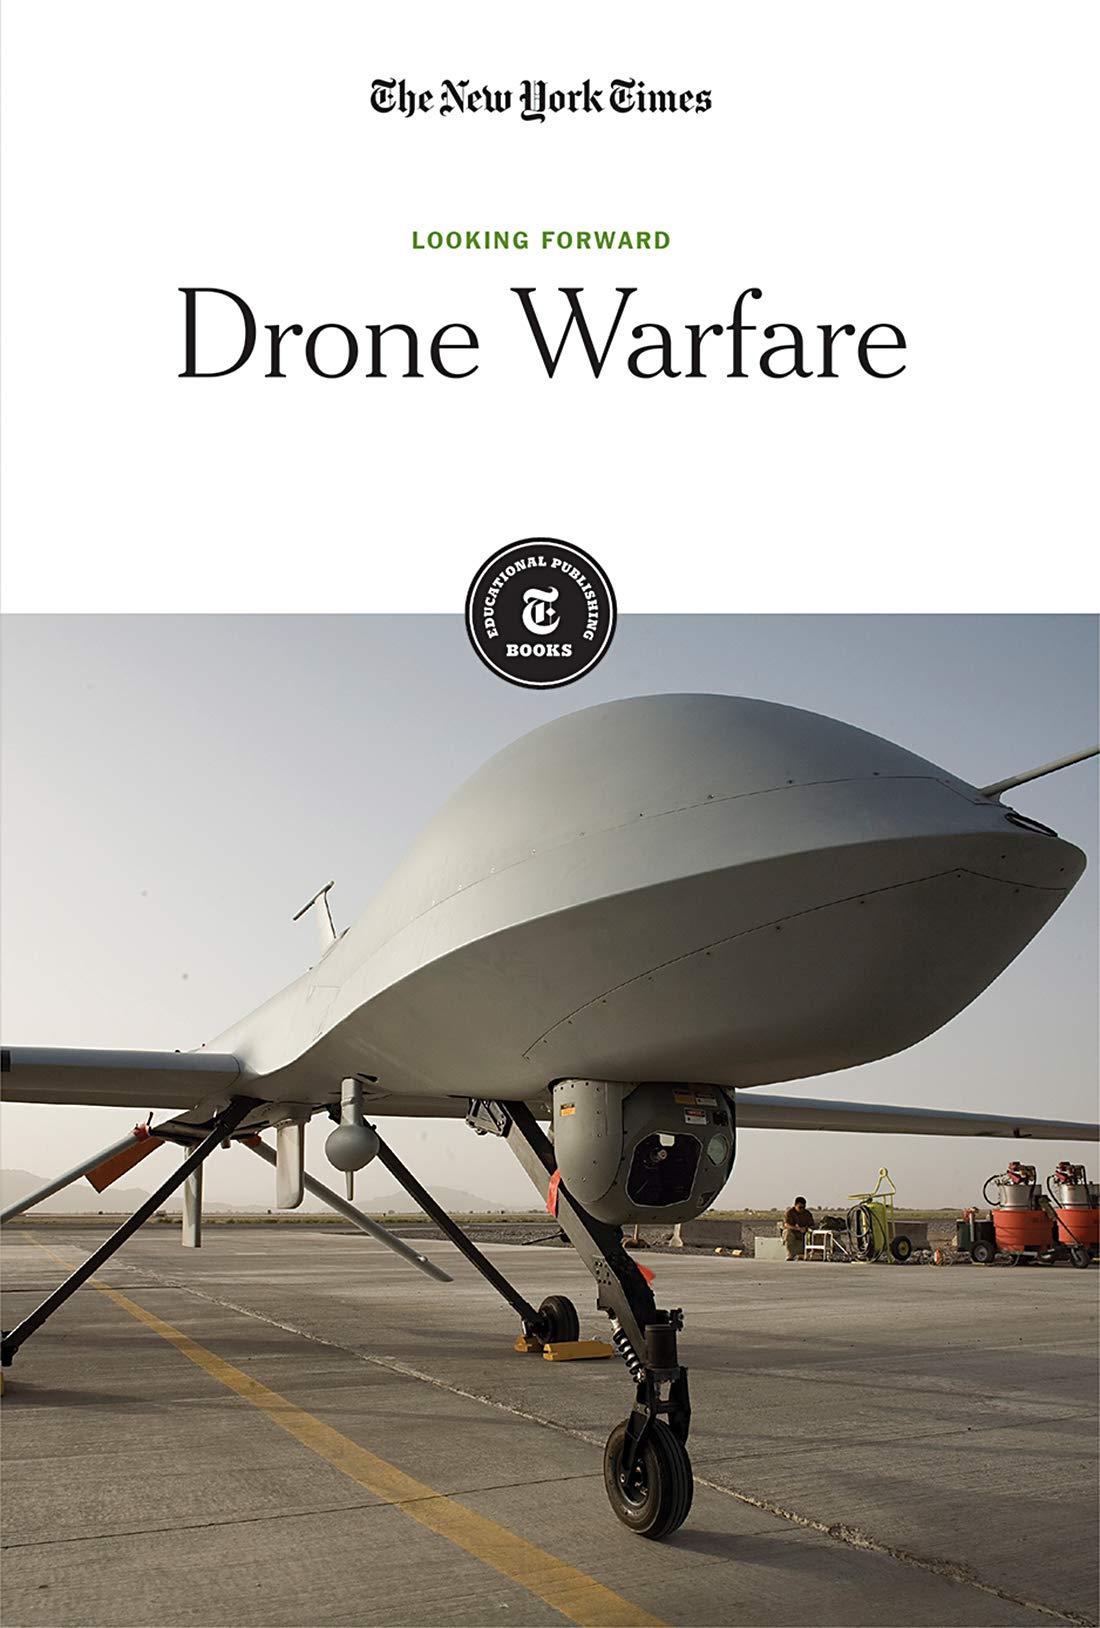 Drone Warfare (Looking Forward): Amazon.es: New York Times Company ...